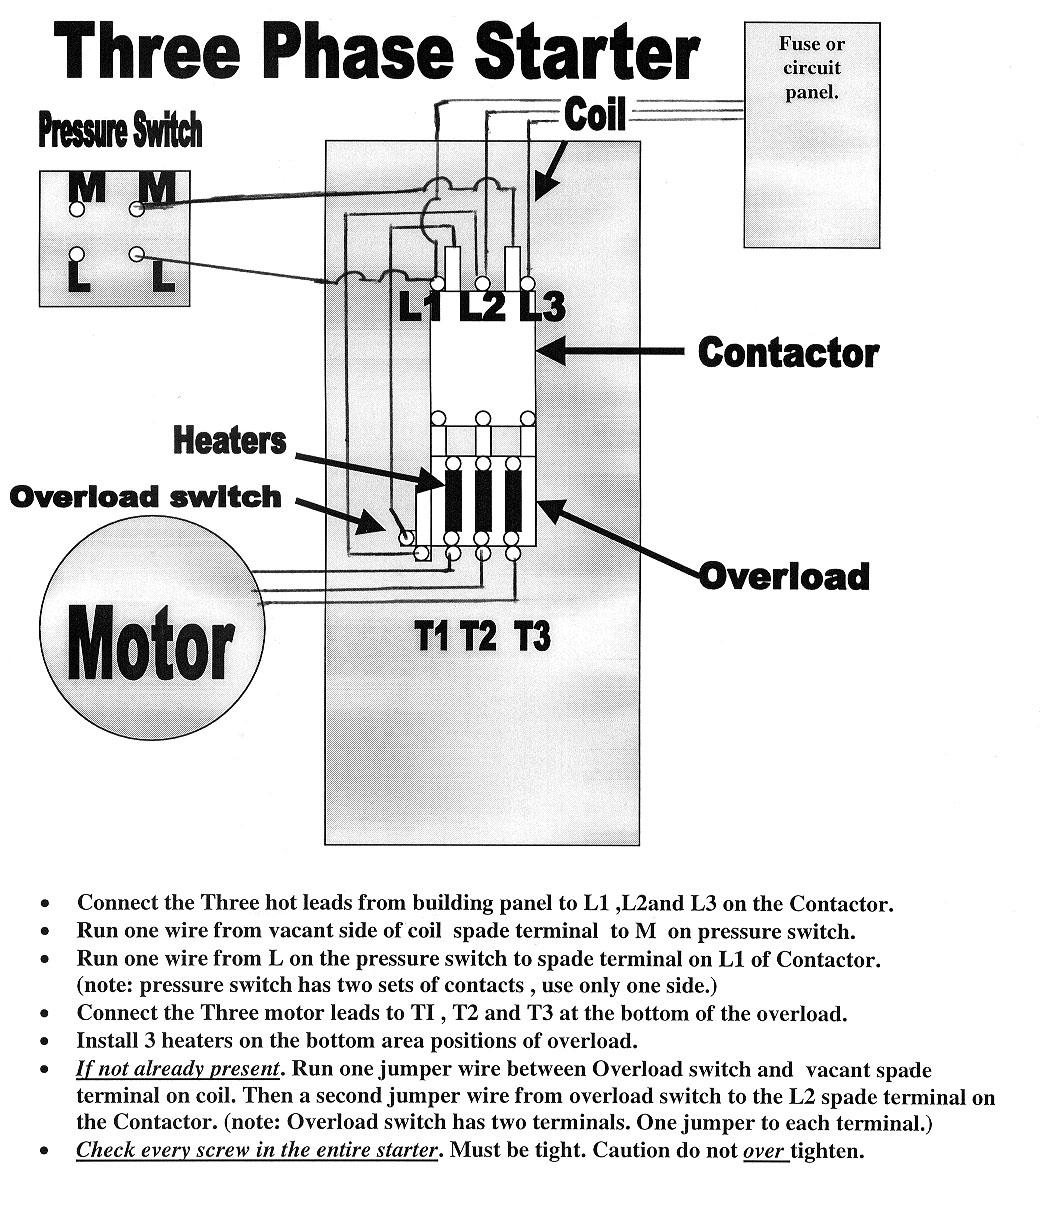 Square D Nema 1 Starter Wiring Diagram - Square D Motor Starter Wiring Diagram